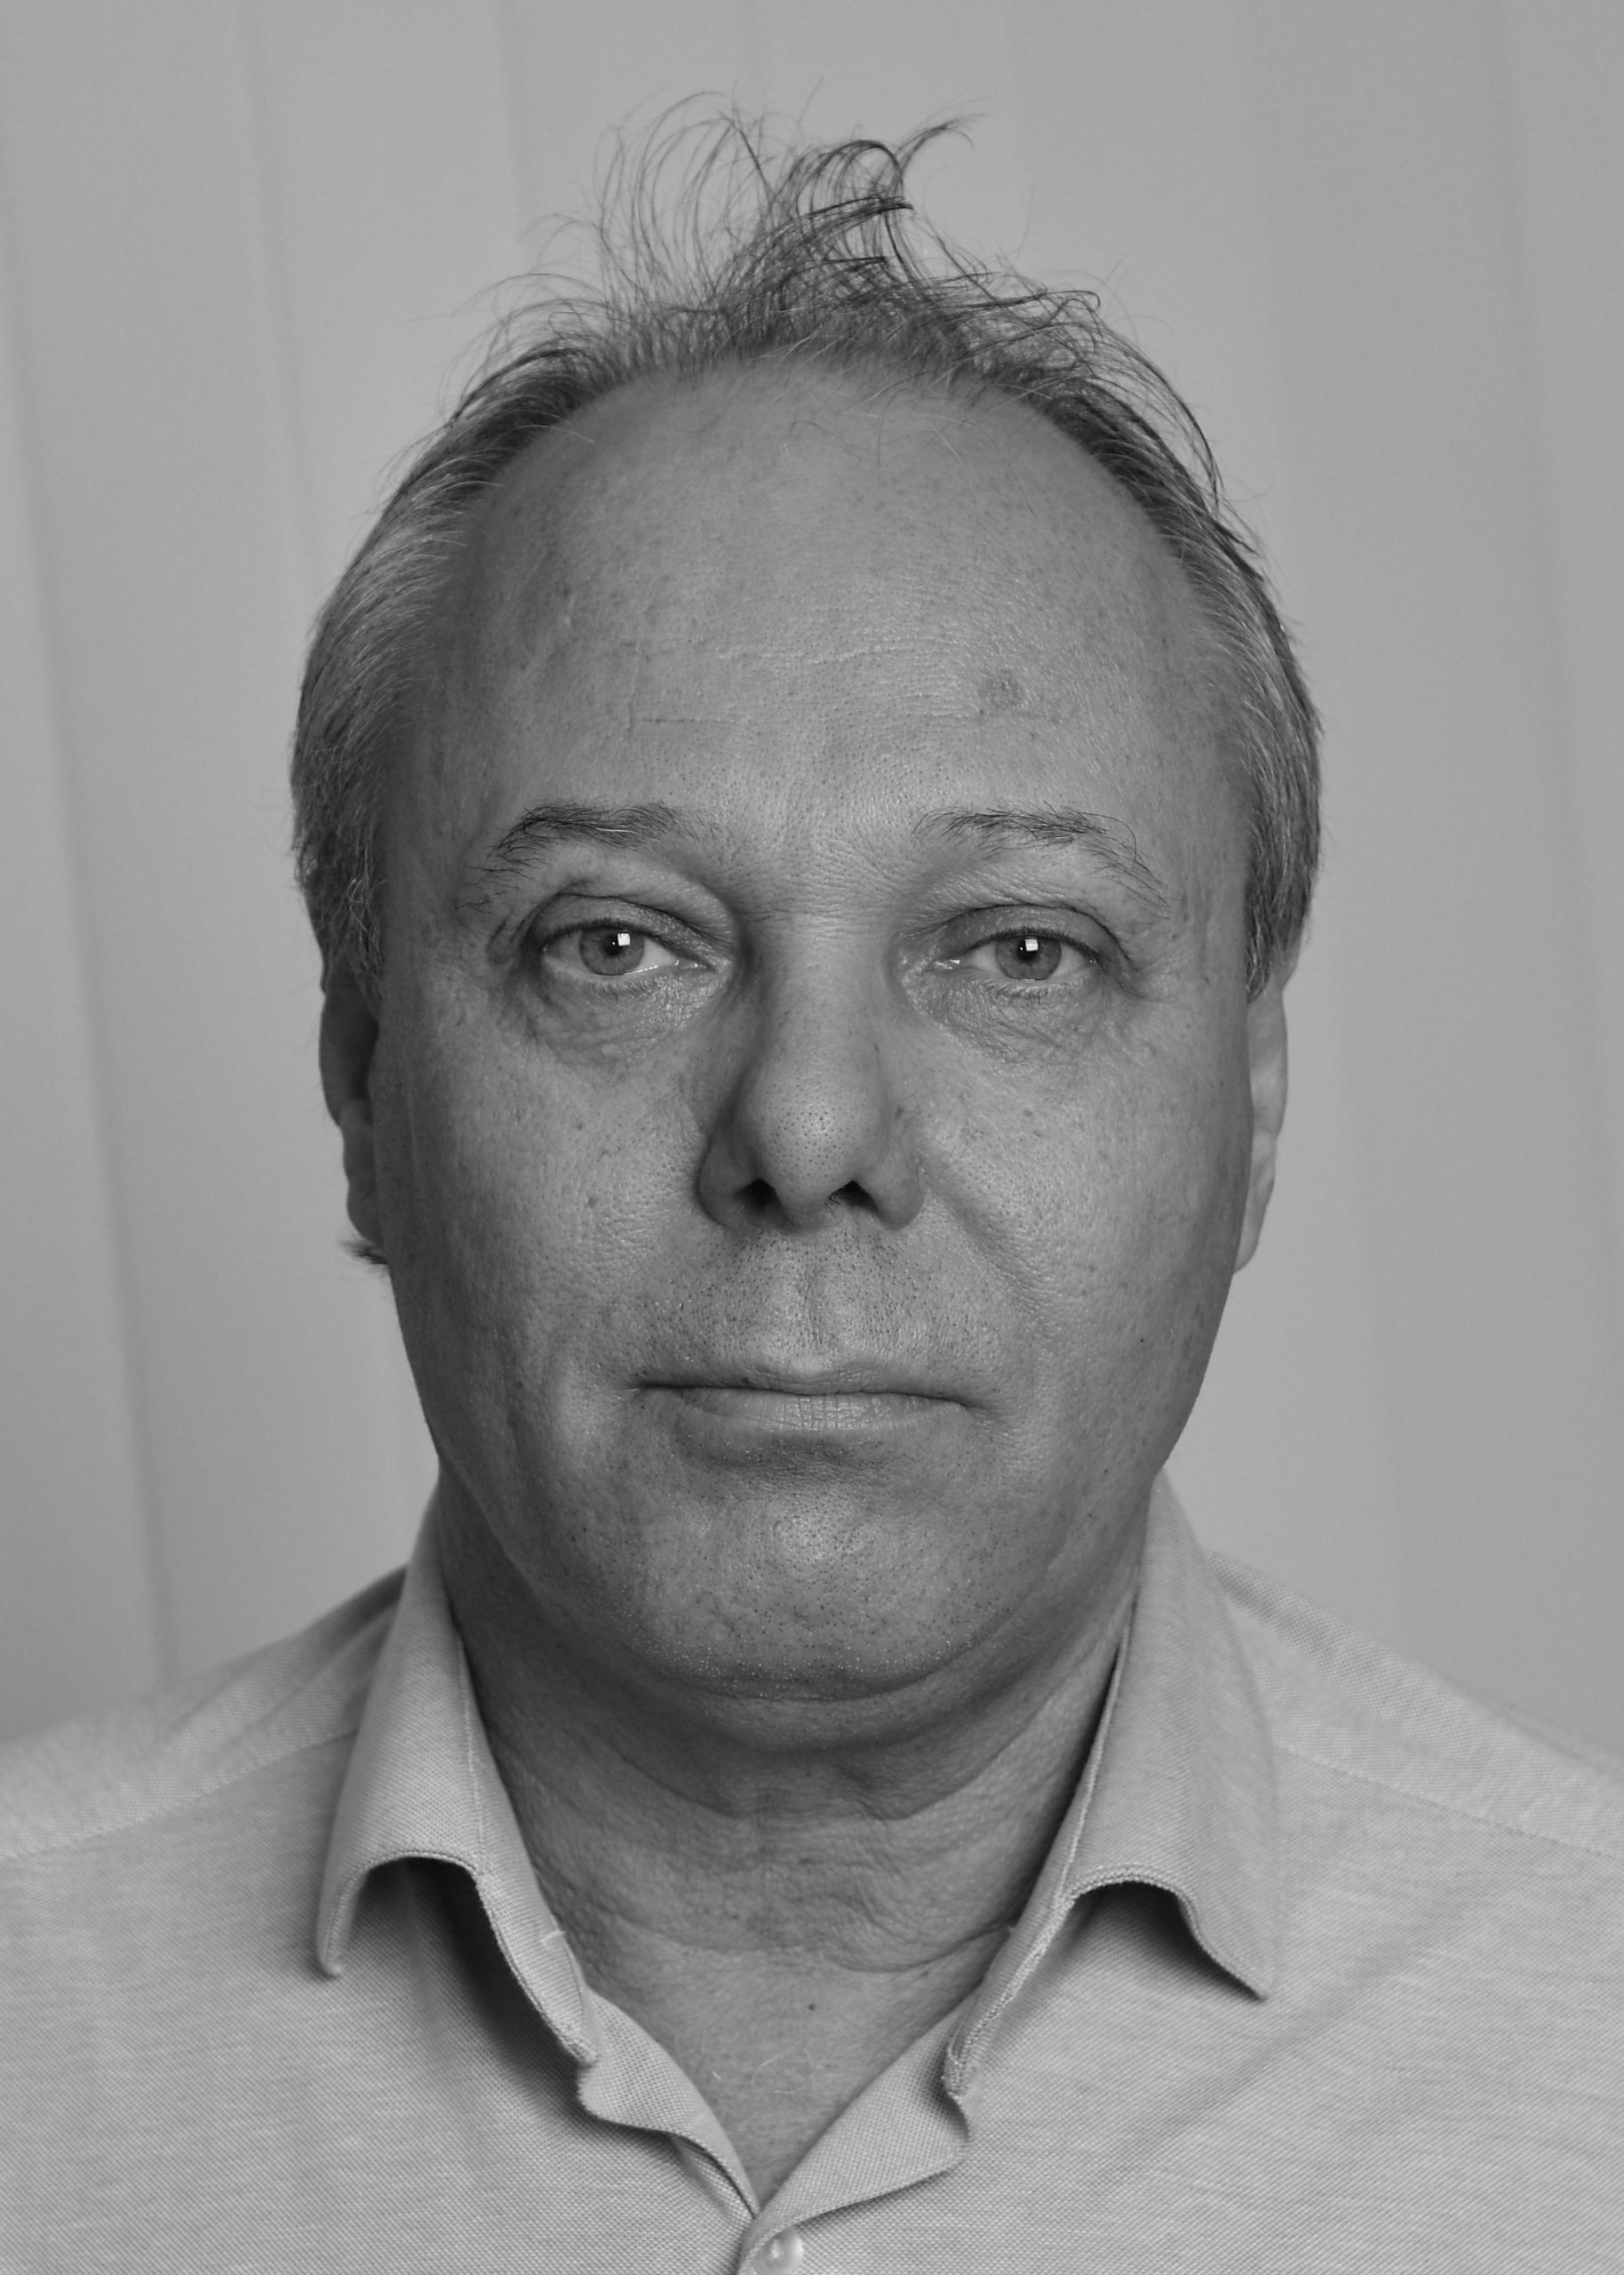 Pjotr van der Horst